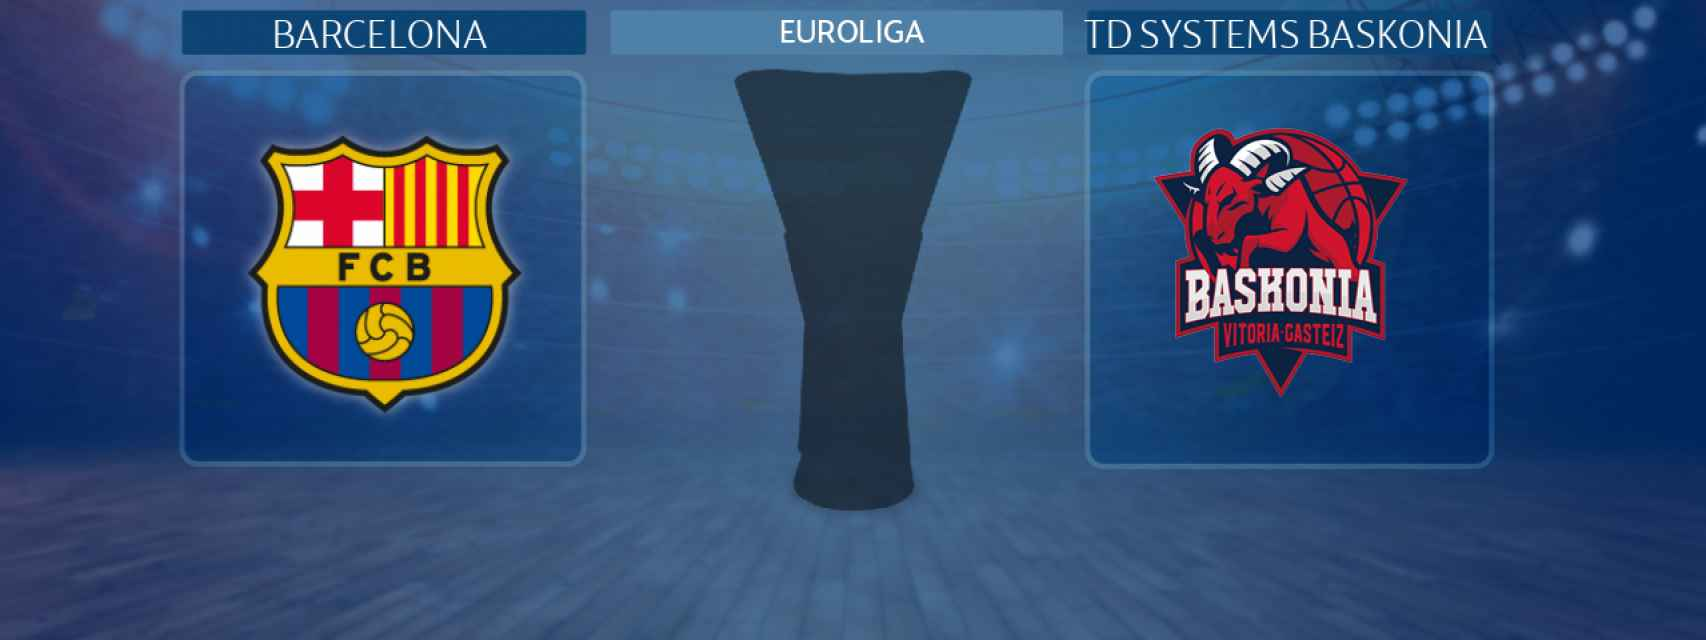 Barcelona - TD Systems Baskonia, partido de la Euroliga